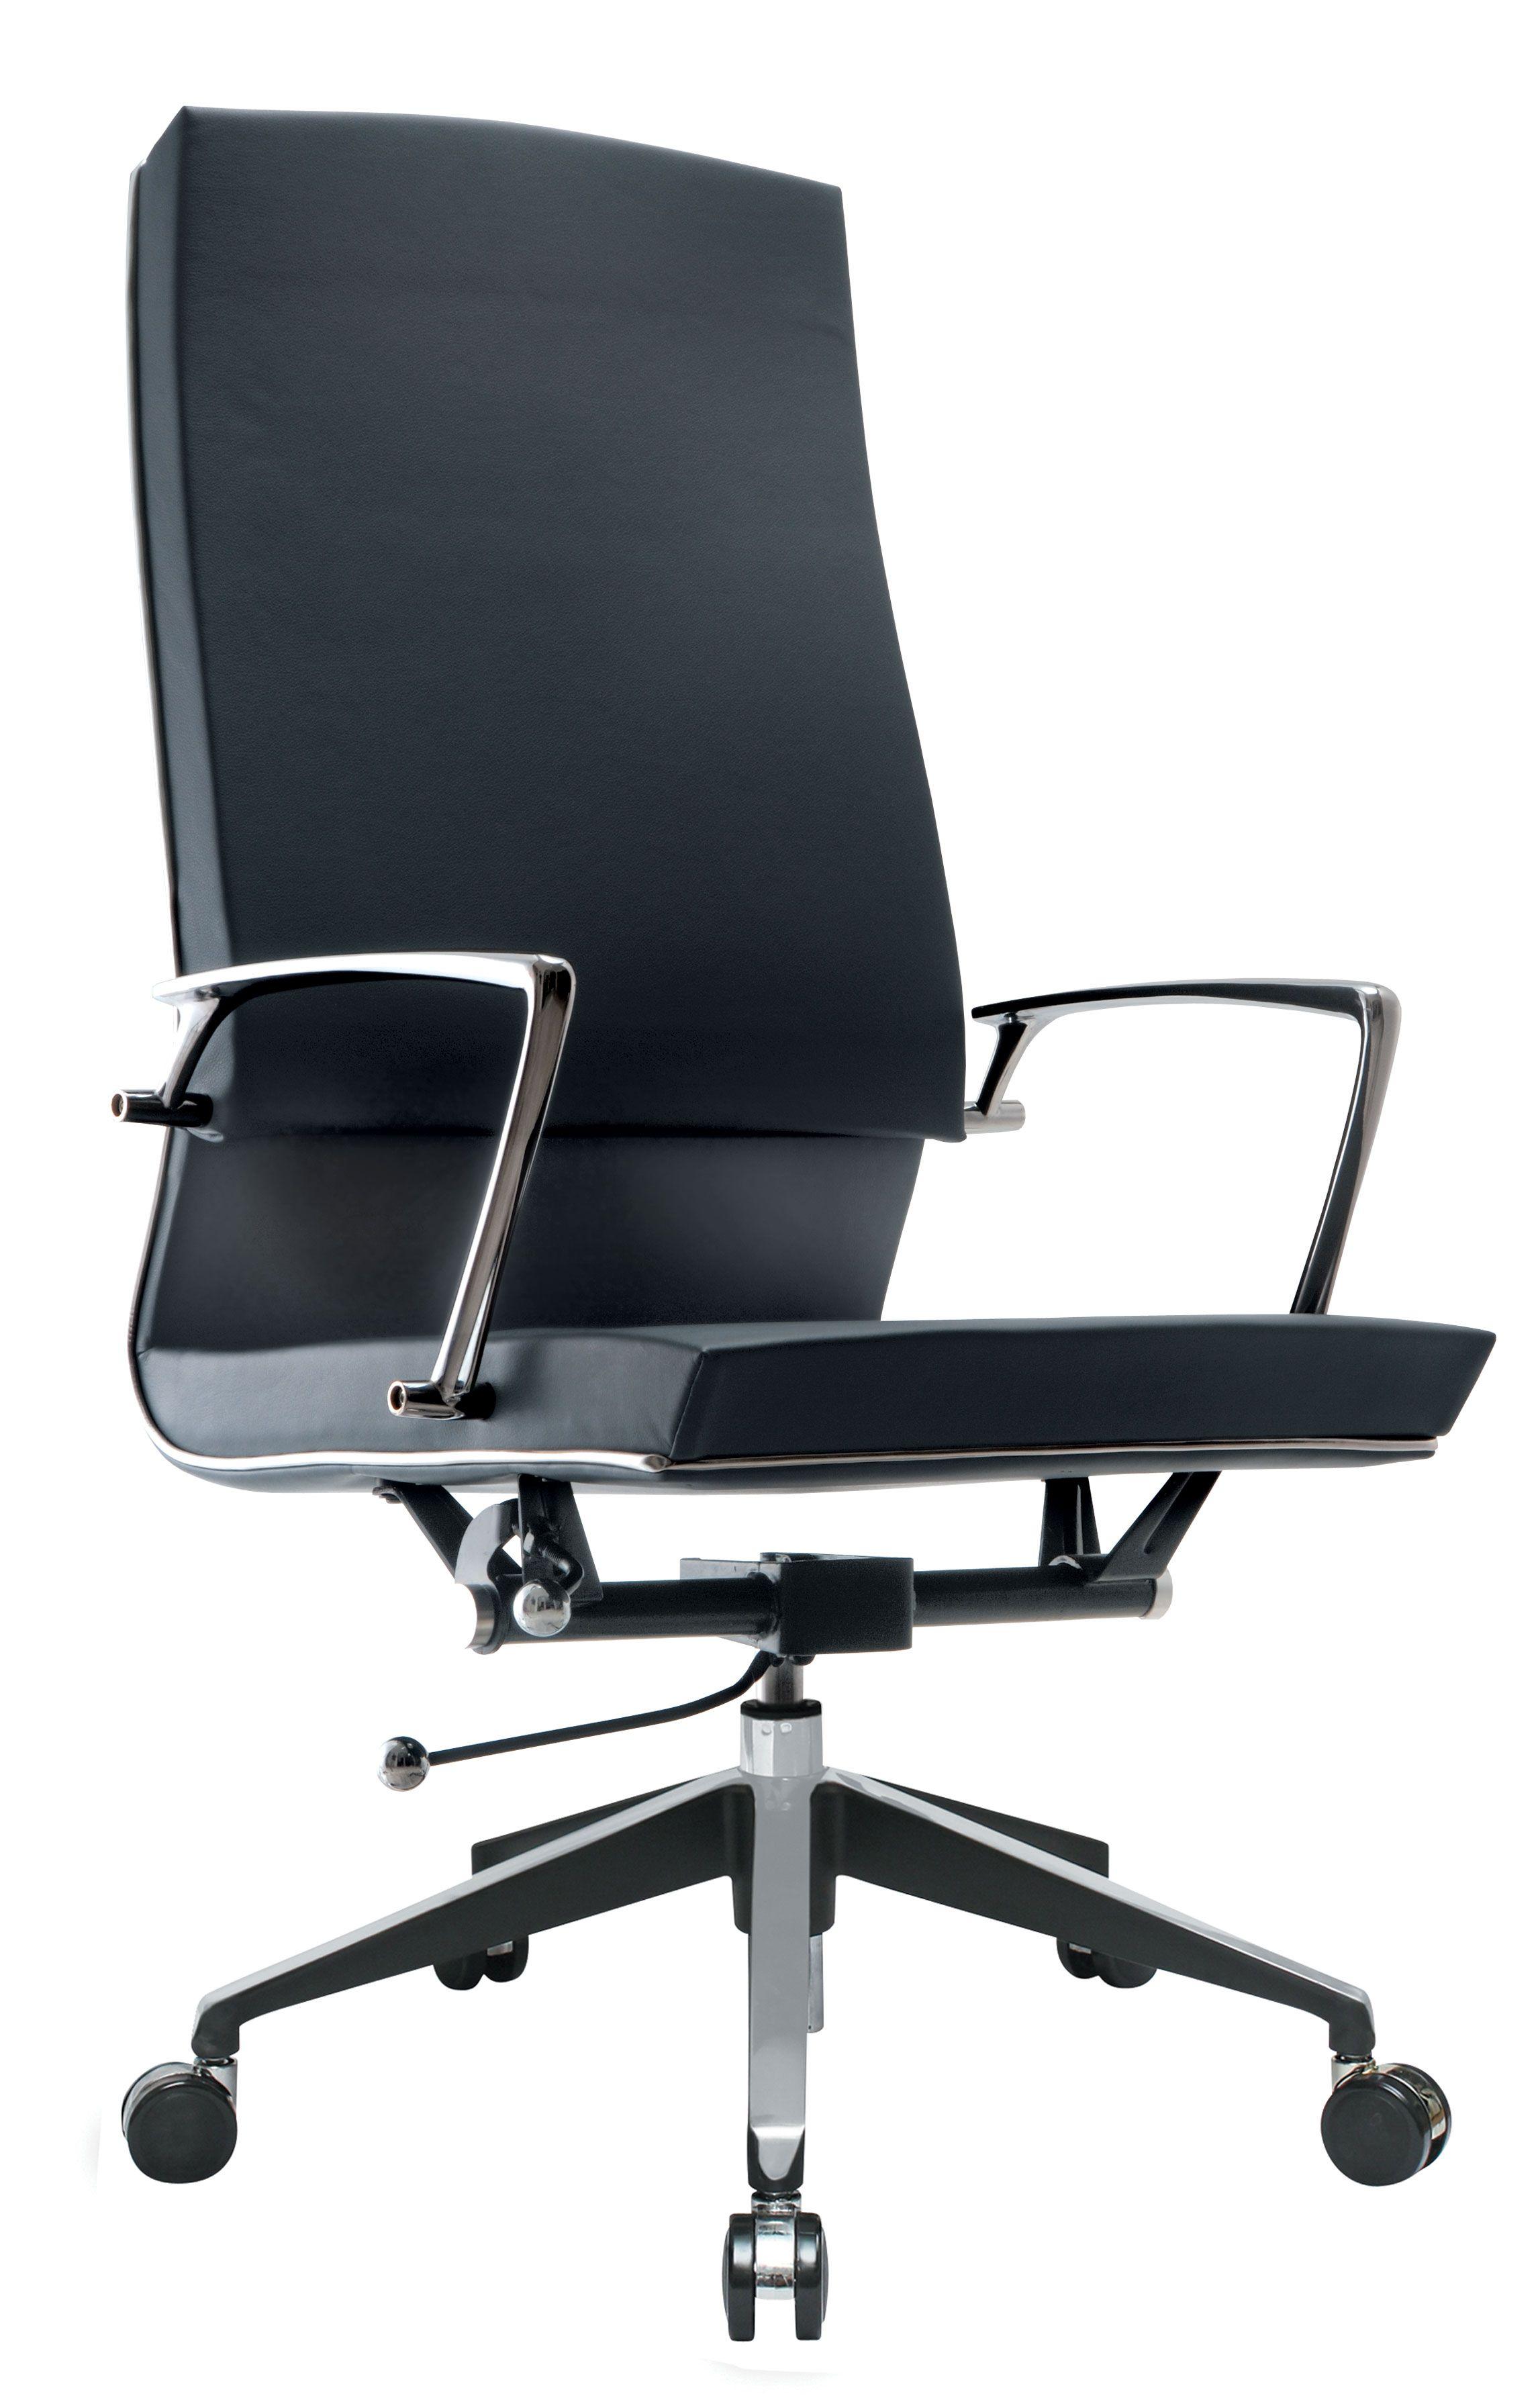 Colonni presidential high back chair cl8811 high